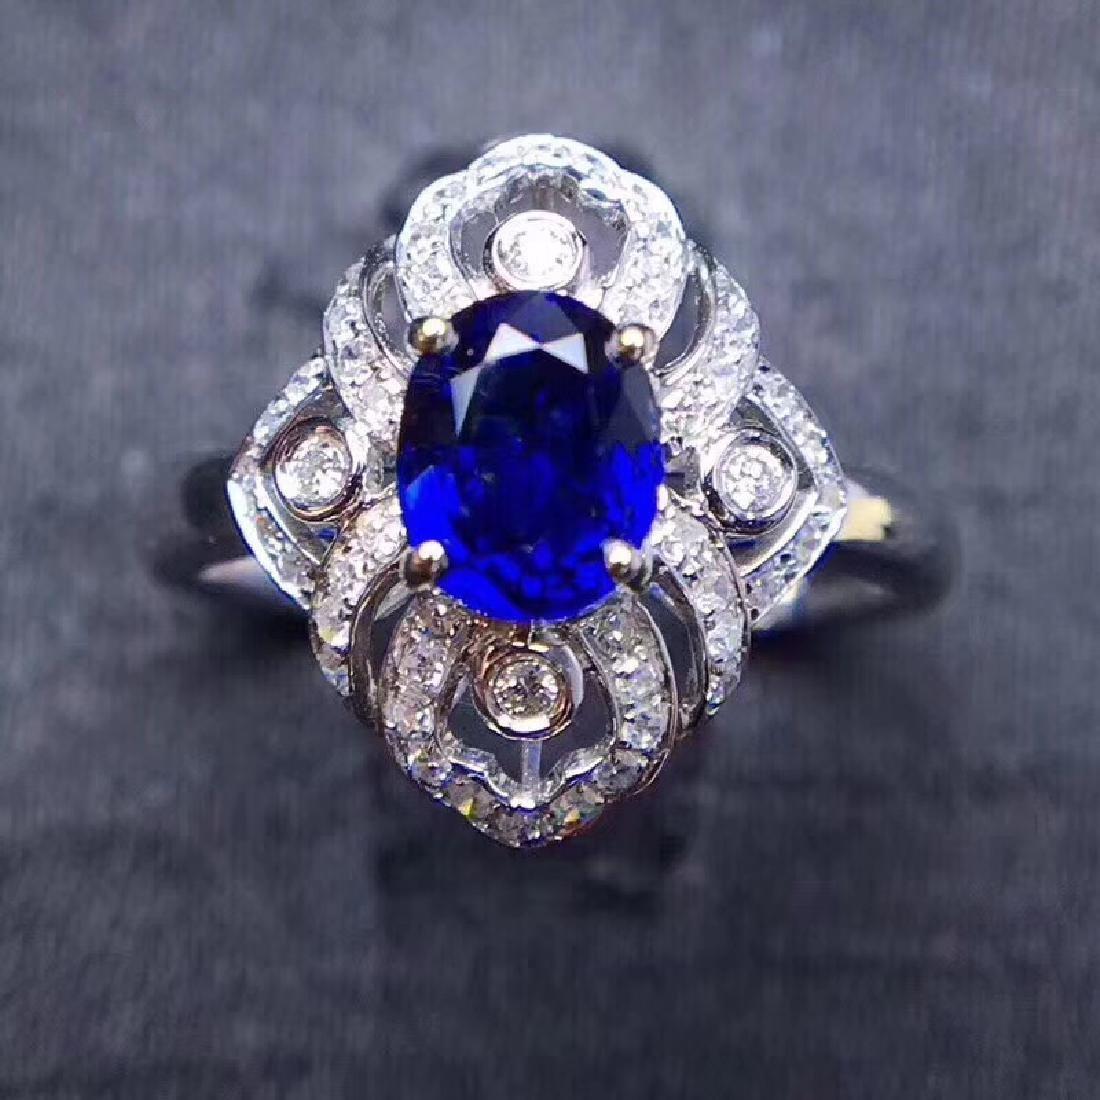 1.18 CTW Sapphire & VS Diamond Ring 18K - 2